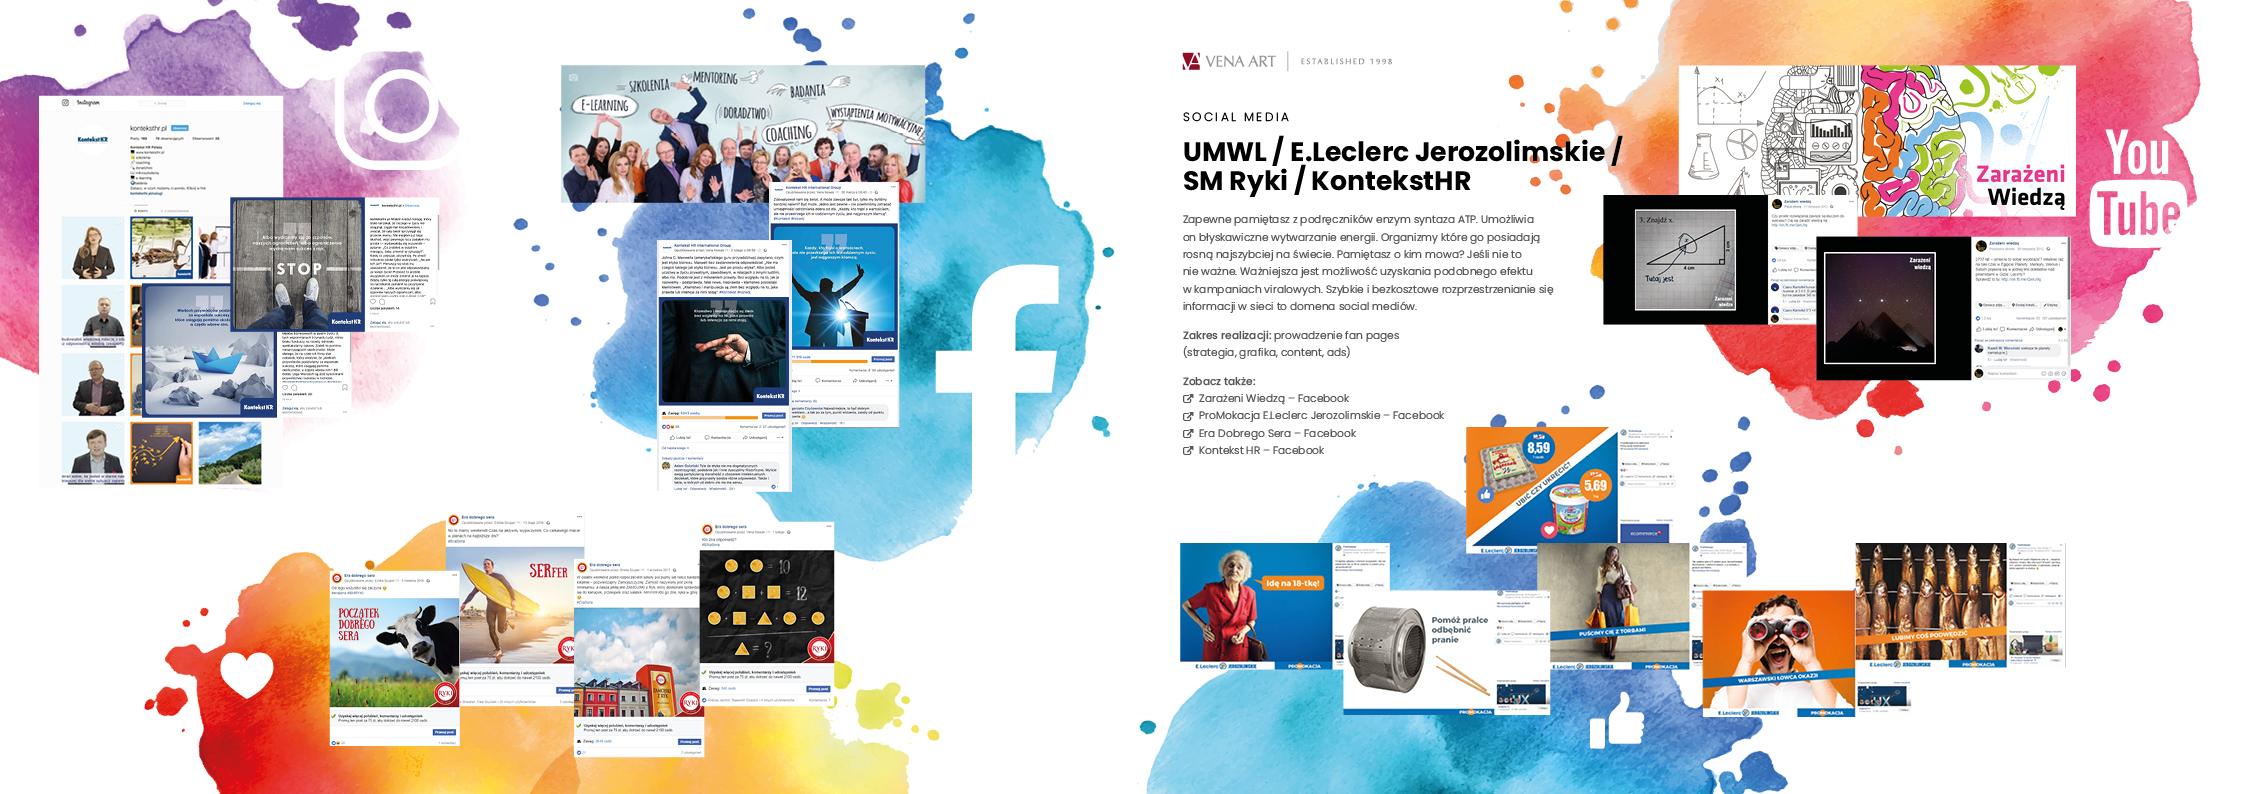 UMWL / E.Leclerc Jerozolimskie / SM Ryki / KontekstHR